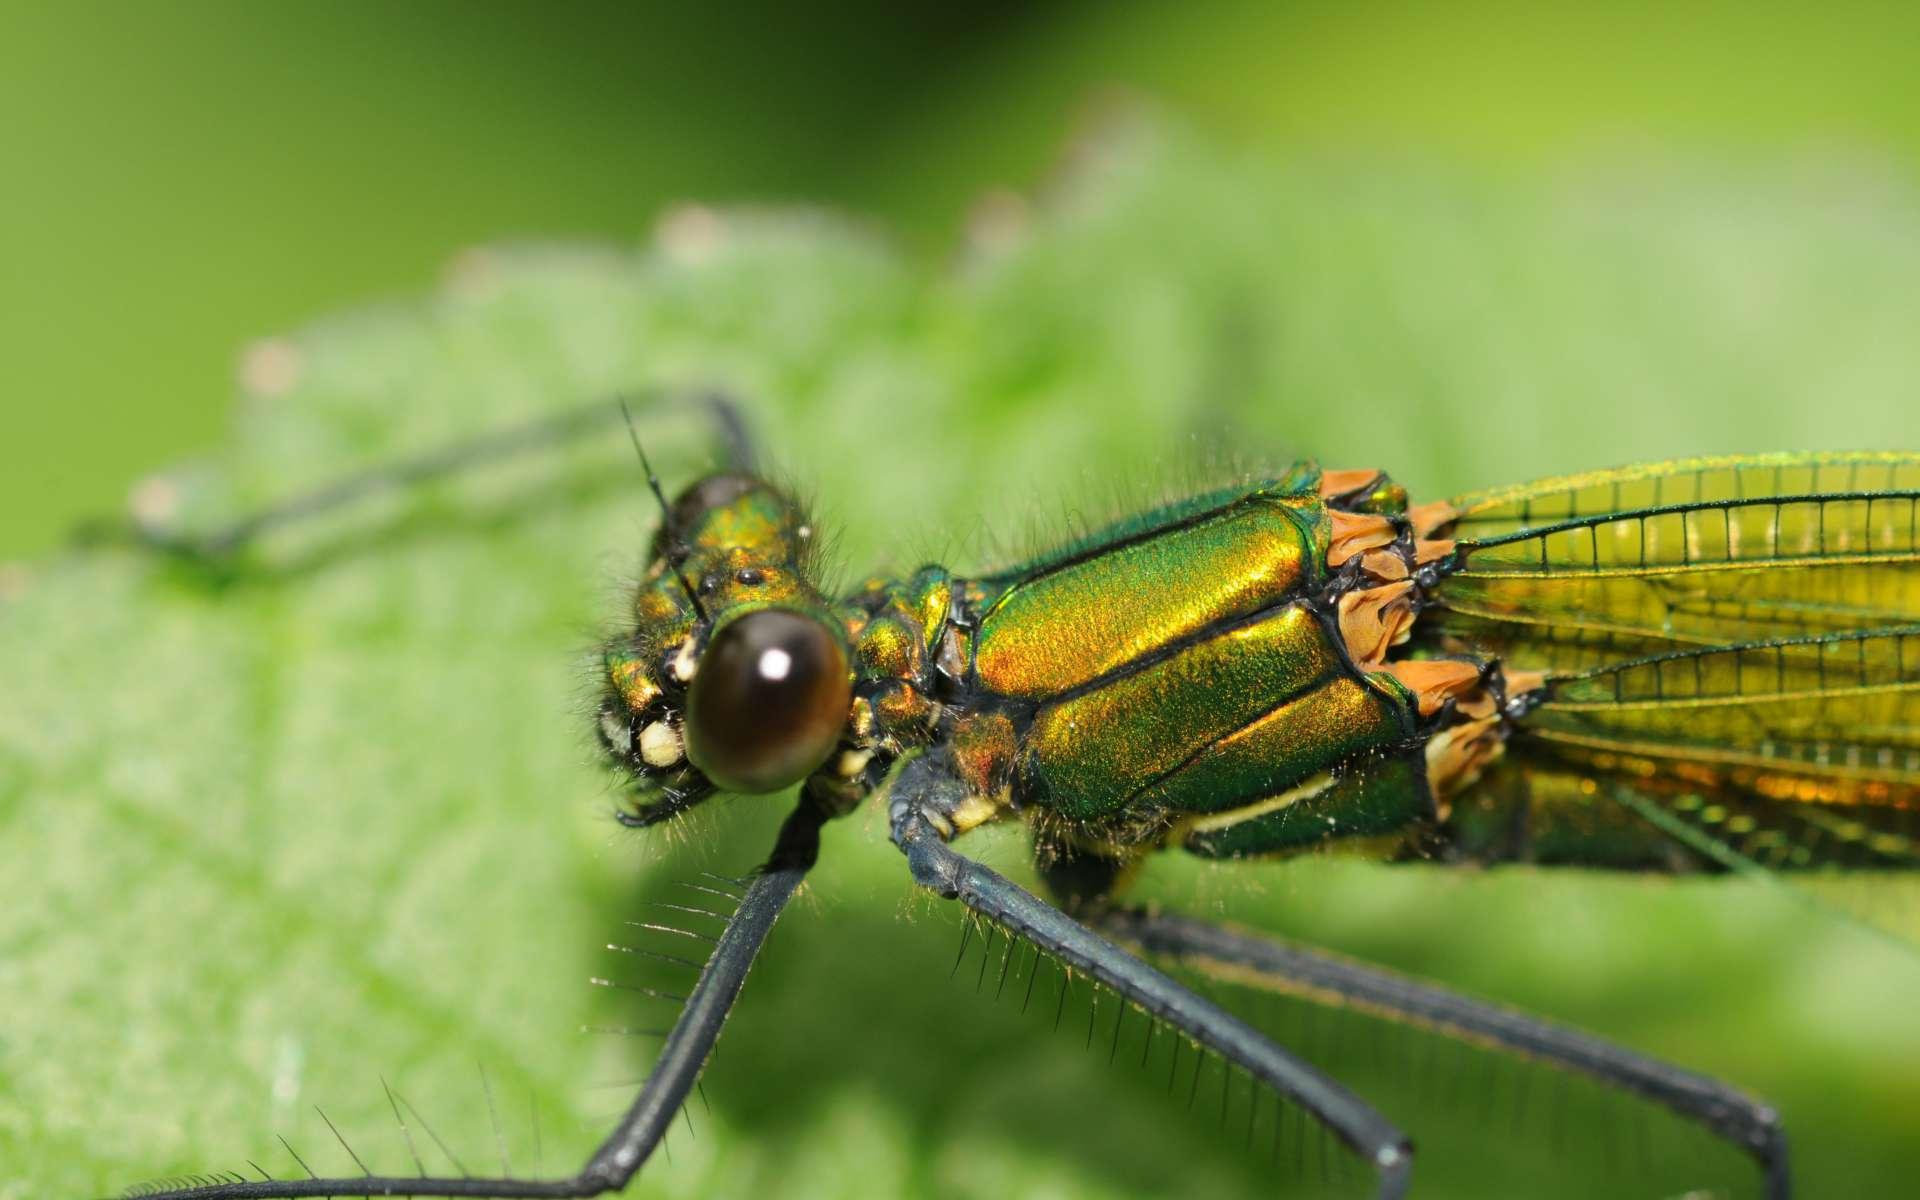 Caloptéryx éclatant - Femelle (Crédits : Thomas Bresson - Flickr)